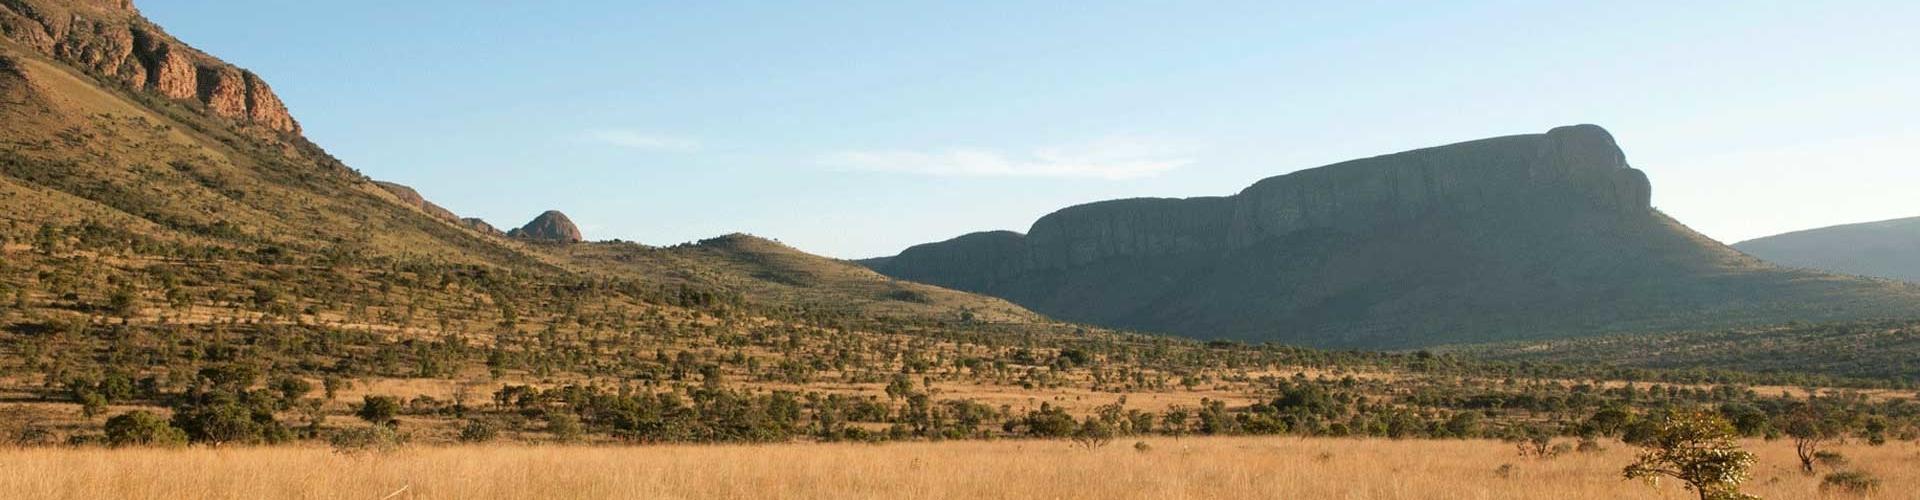 Marakele National Park Zuid-Afrika